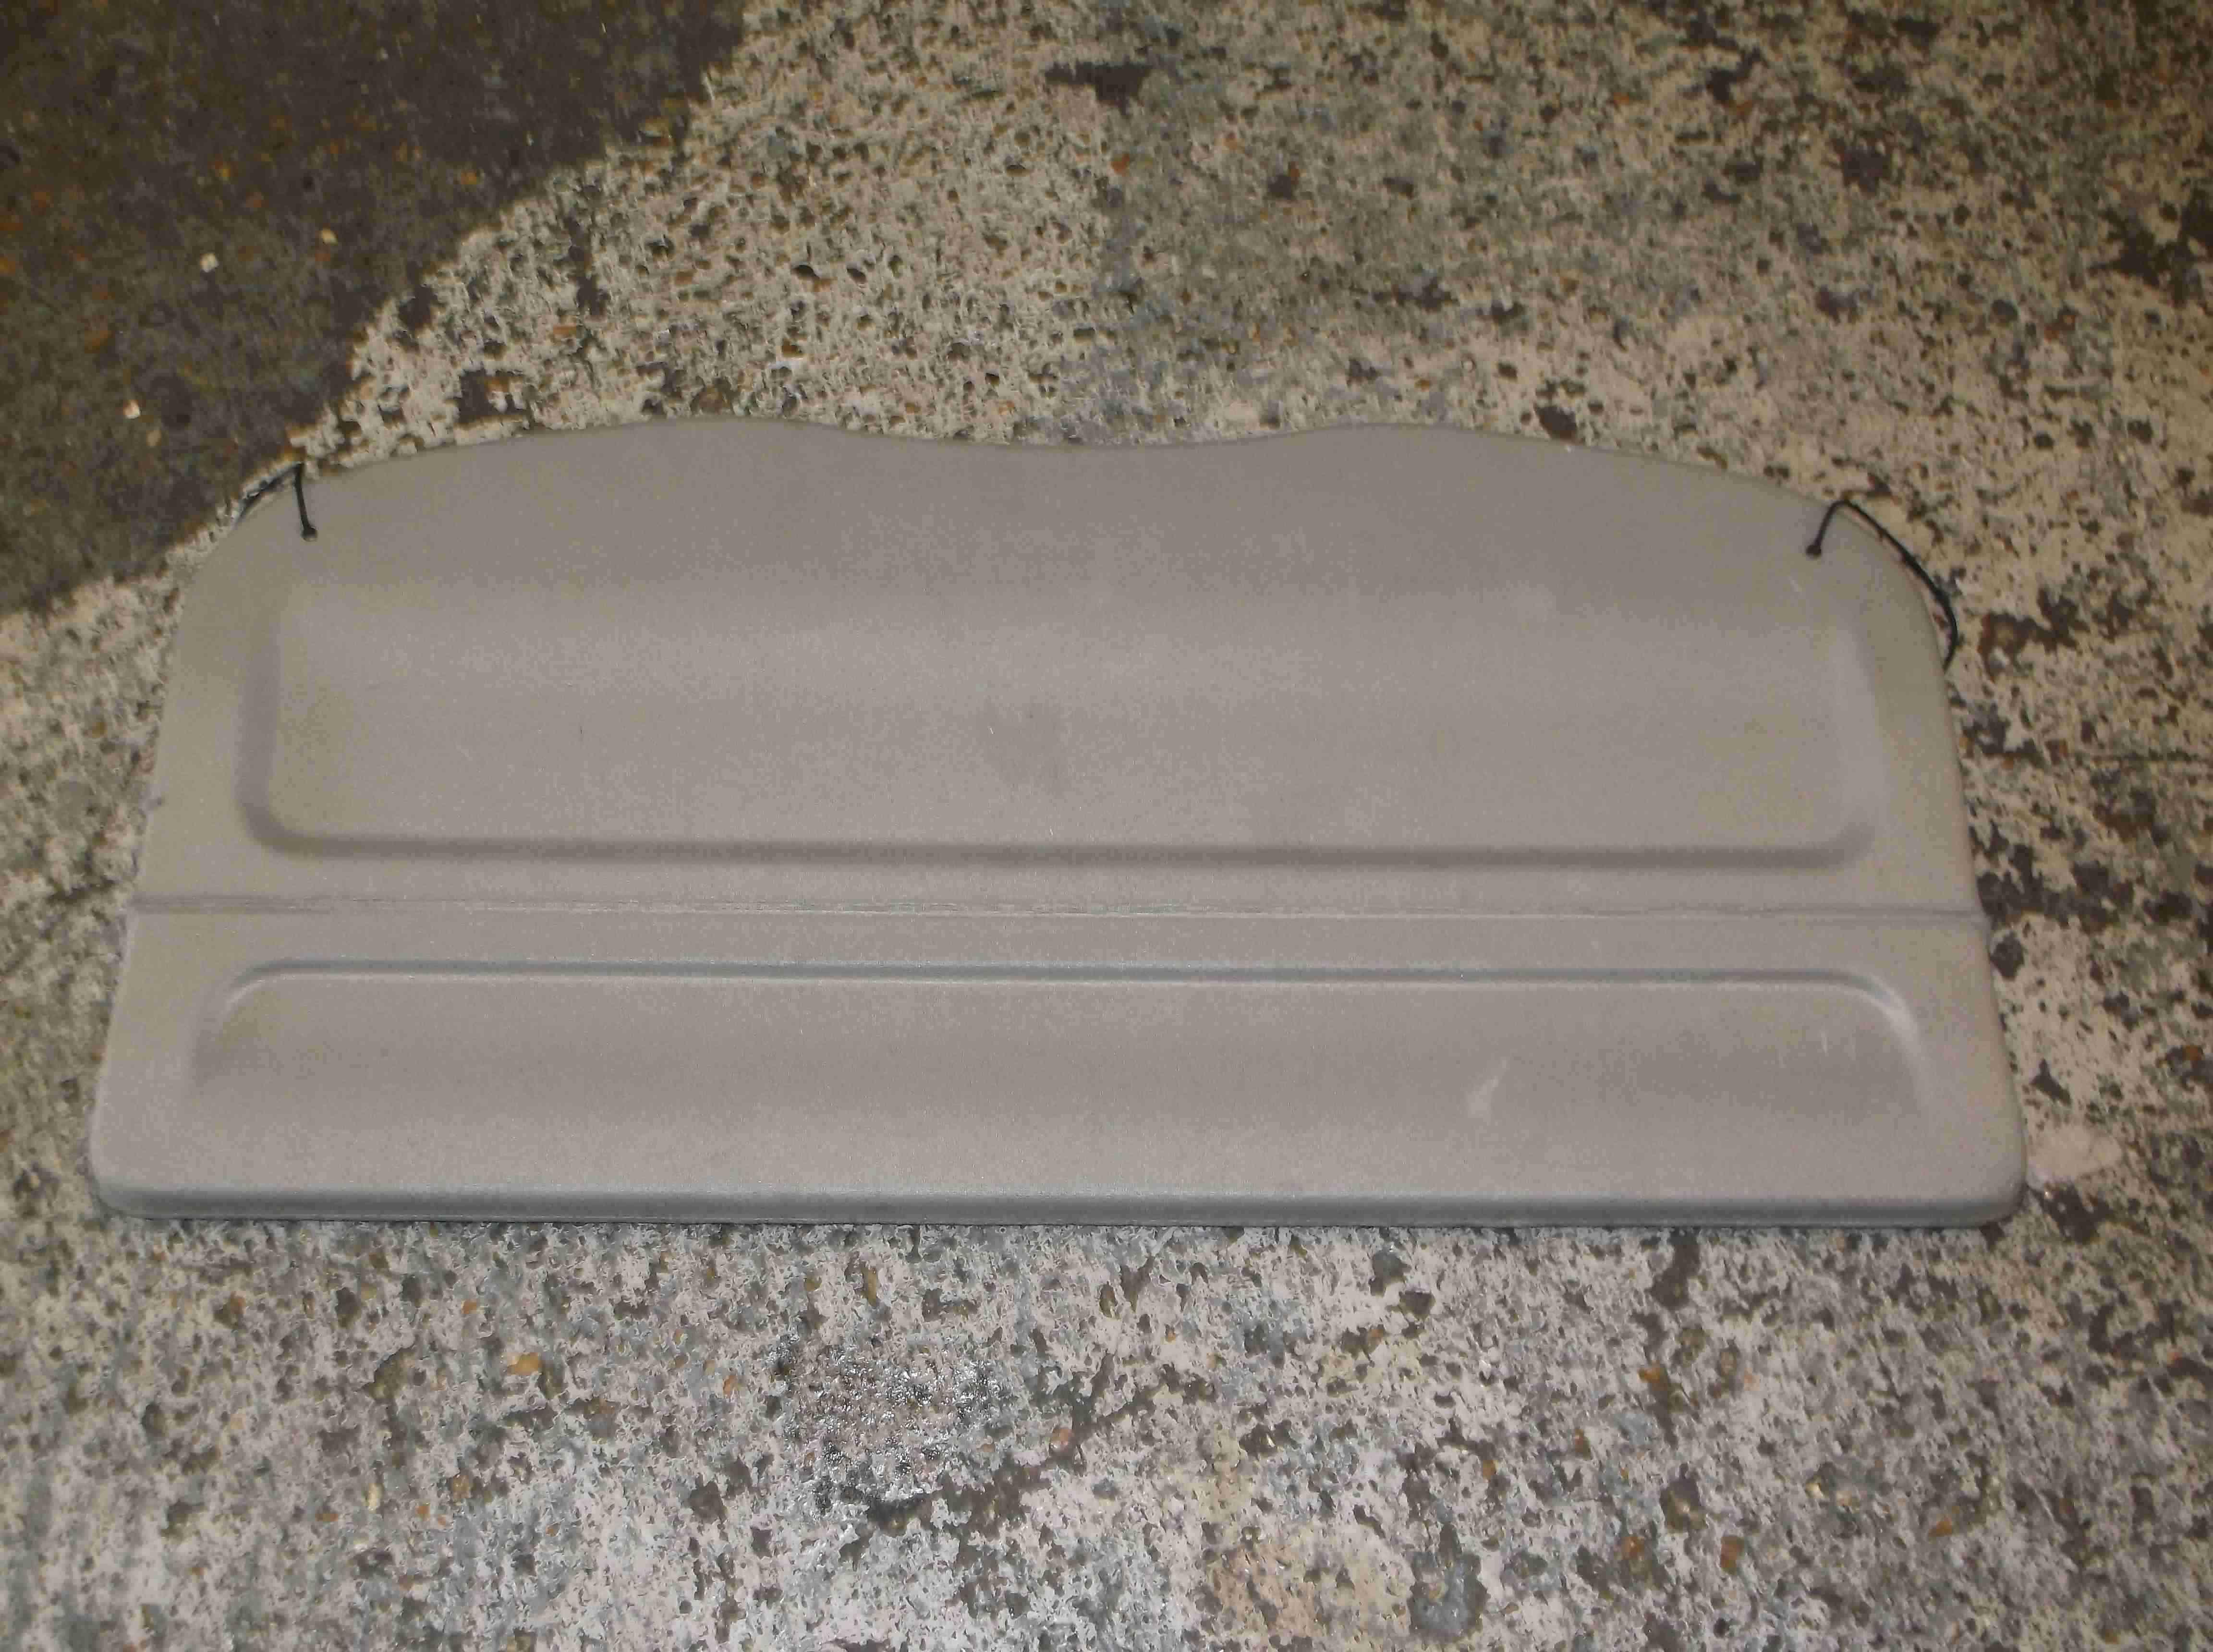 Renault Megane Scenic 2003-2009 Parcel Shelf Tray Load Cover